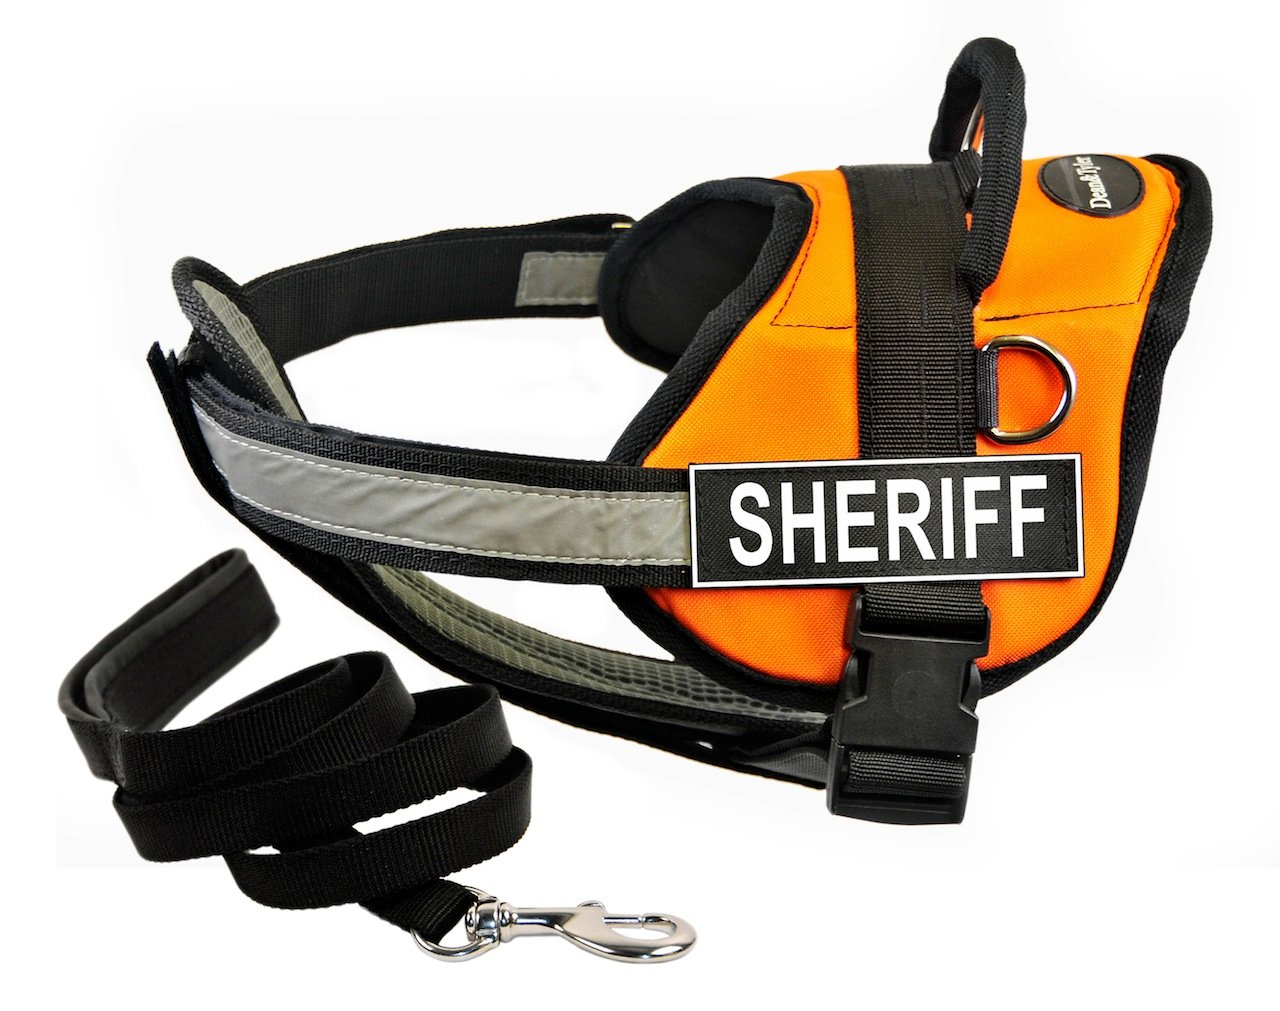 Dean & Tyler DT Works arancia Sheriff Torace Imbracatura con Imbottitura, Piccolo, e Nero 1,8 m Padded Puppy guinzaglio.